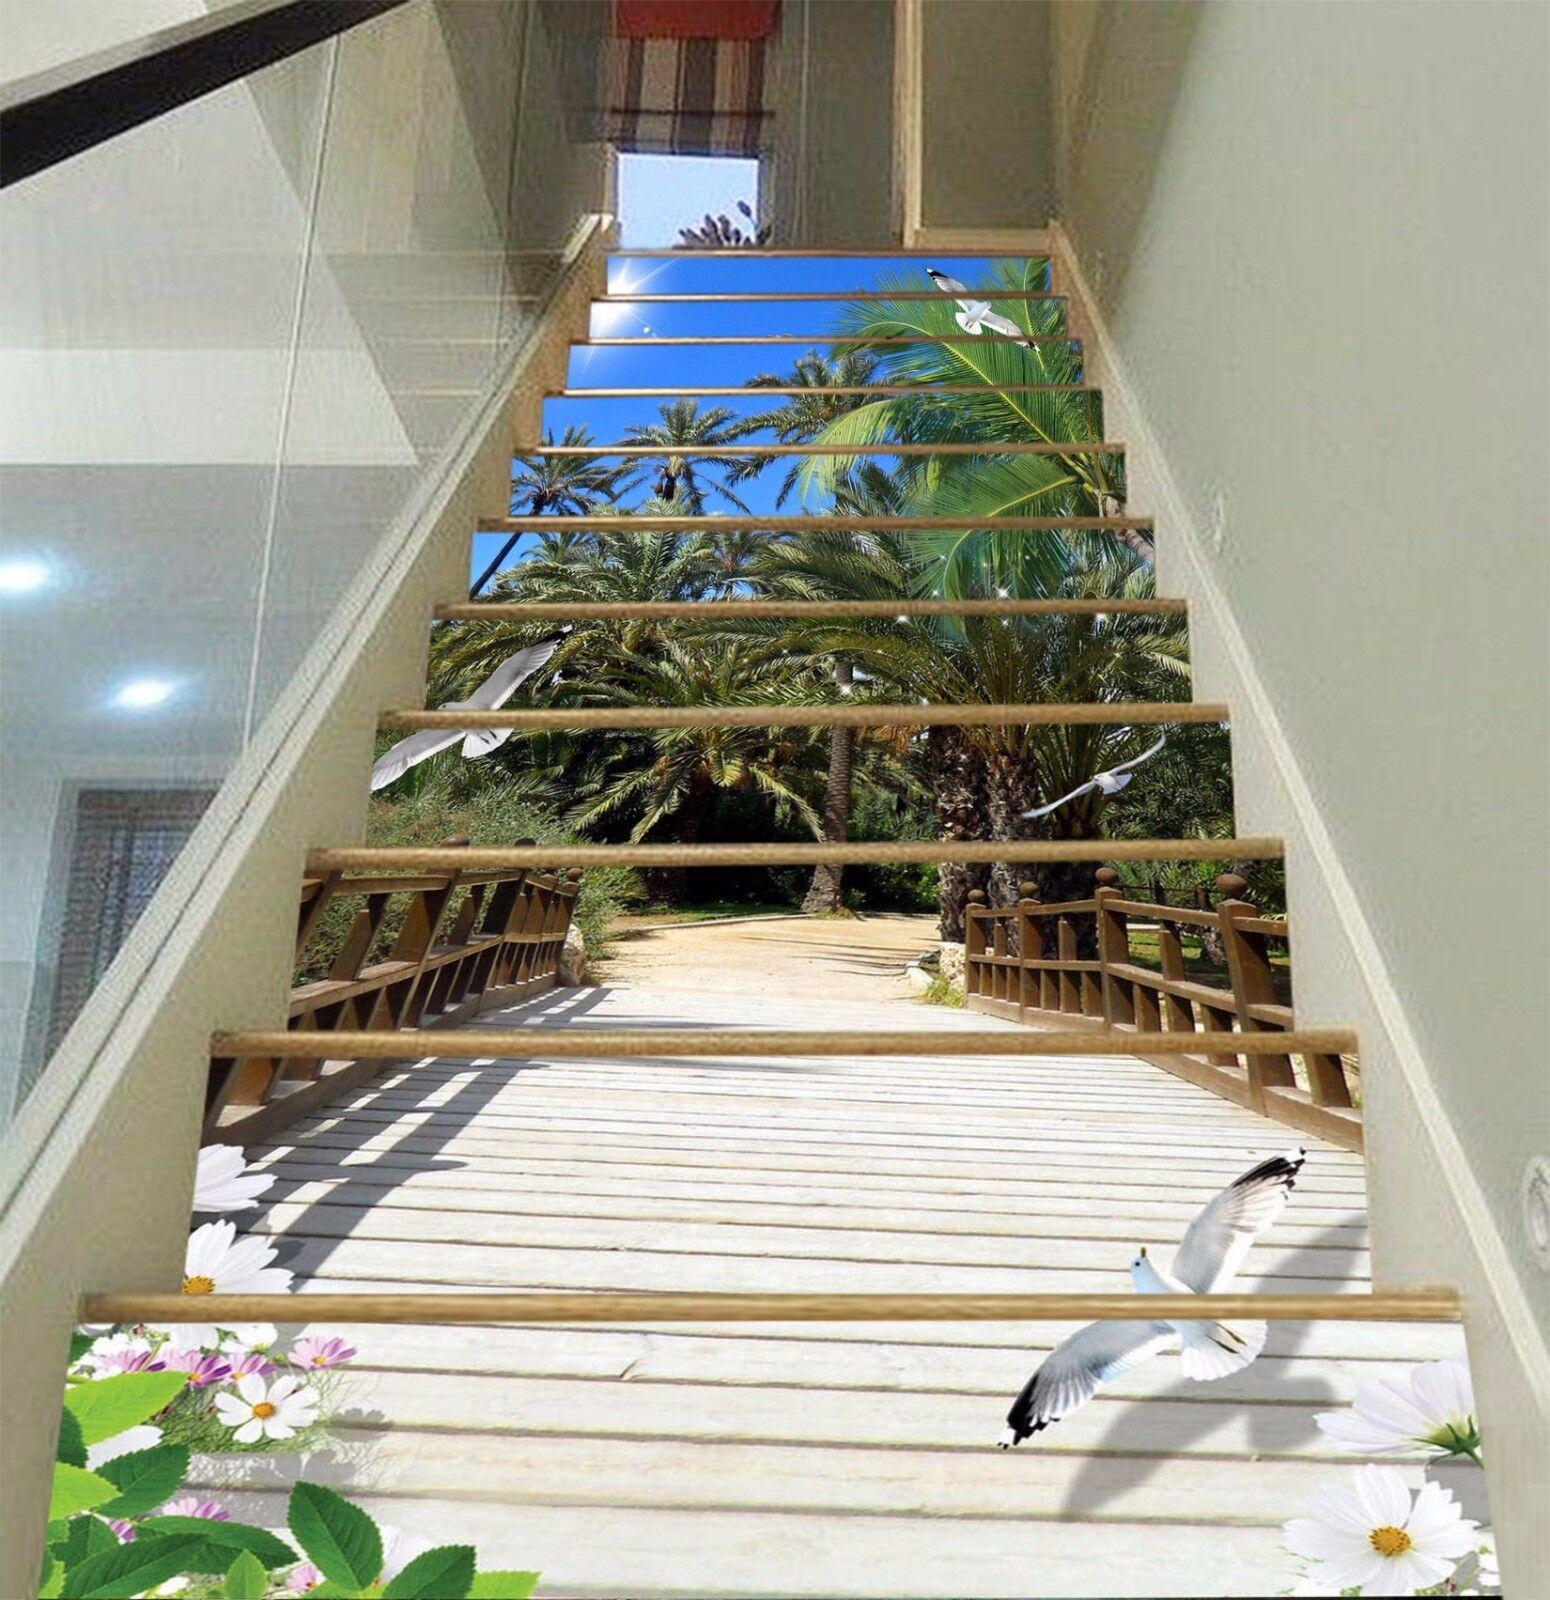 3D Bridge Tree 416 Risers Decoration Photo Mural Vinyl Decal Wallpaper CA